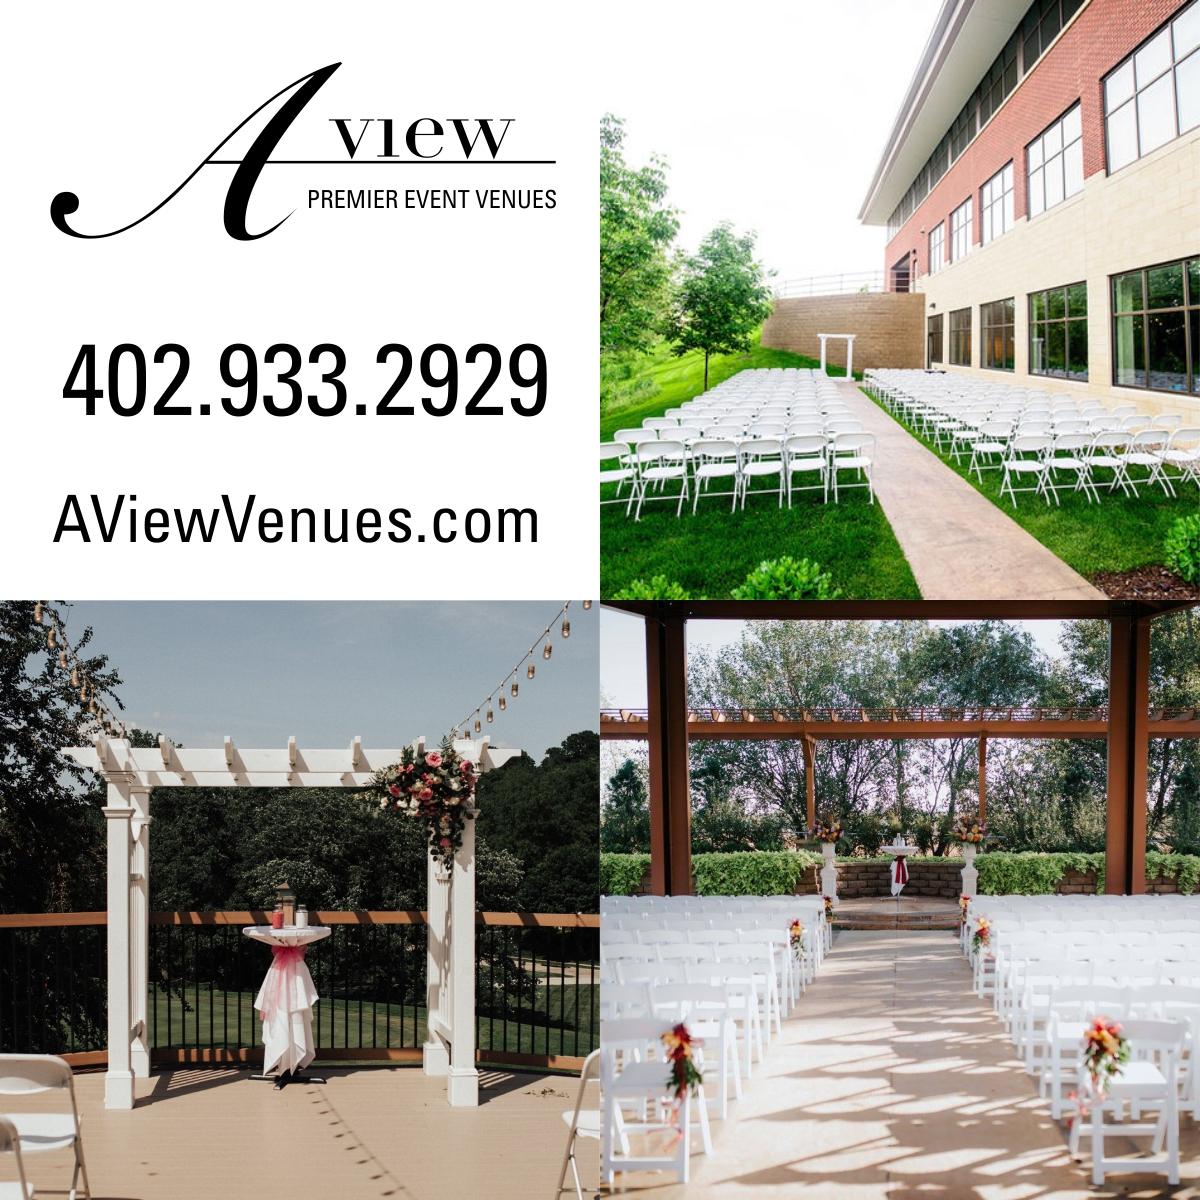 A View Event Venues - Omaha, NE    Britney McLaughlin